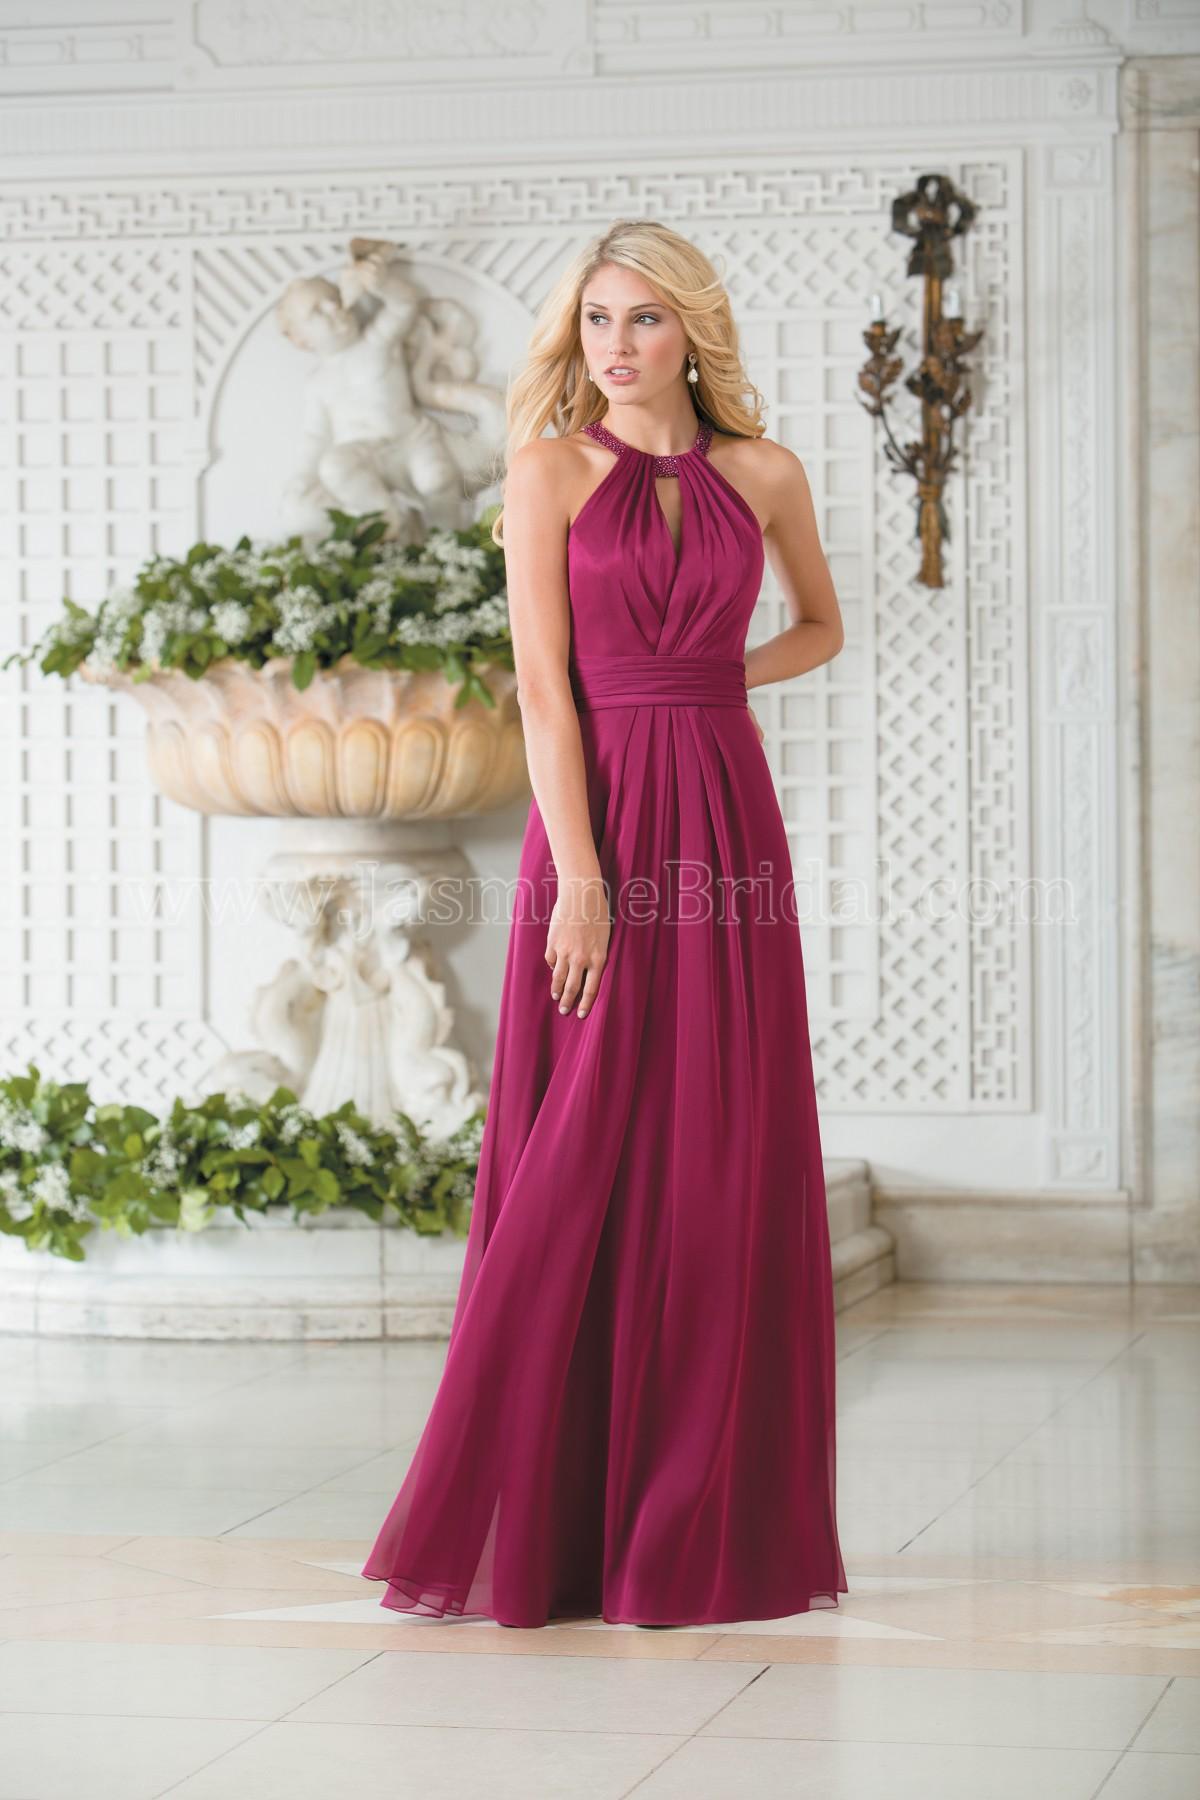 View Dress BELSOIE SPRING 2015 L